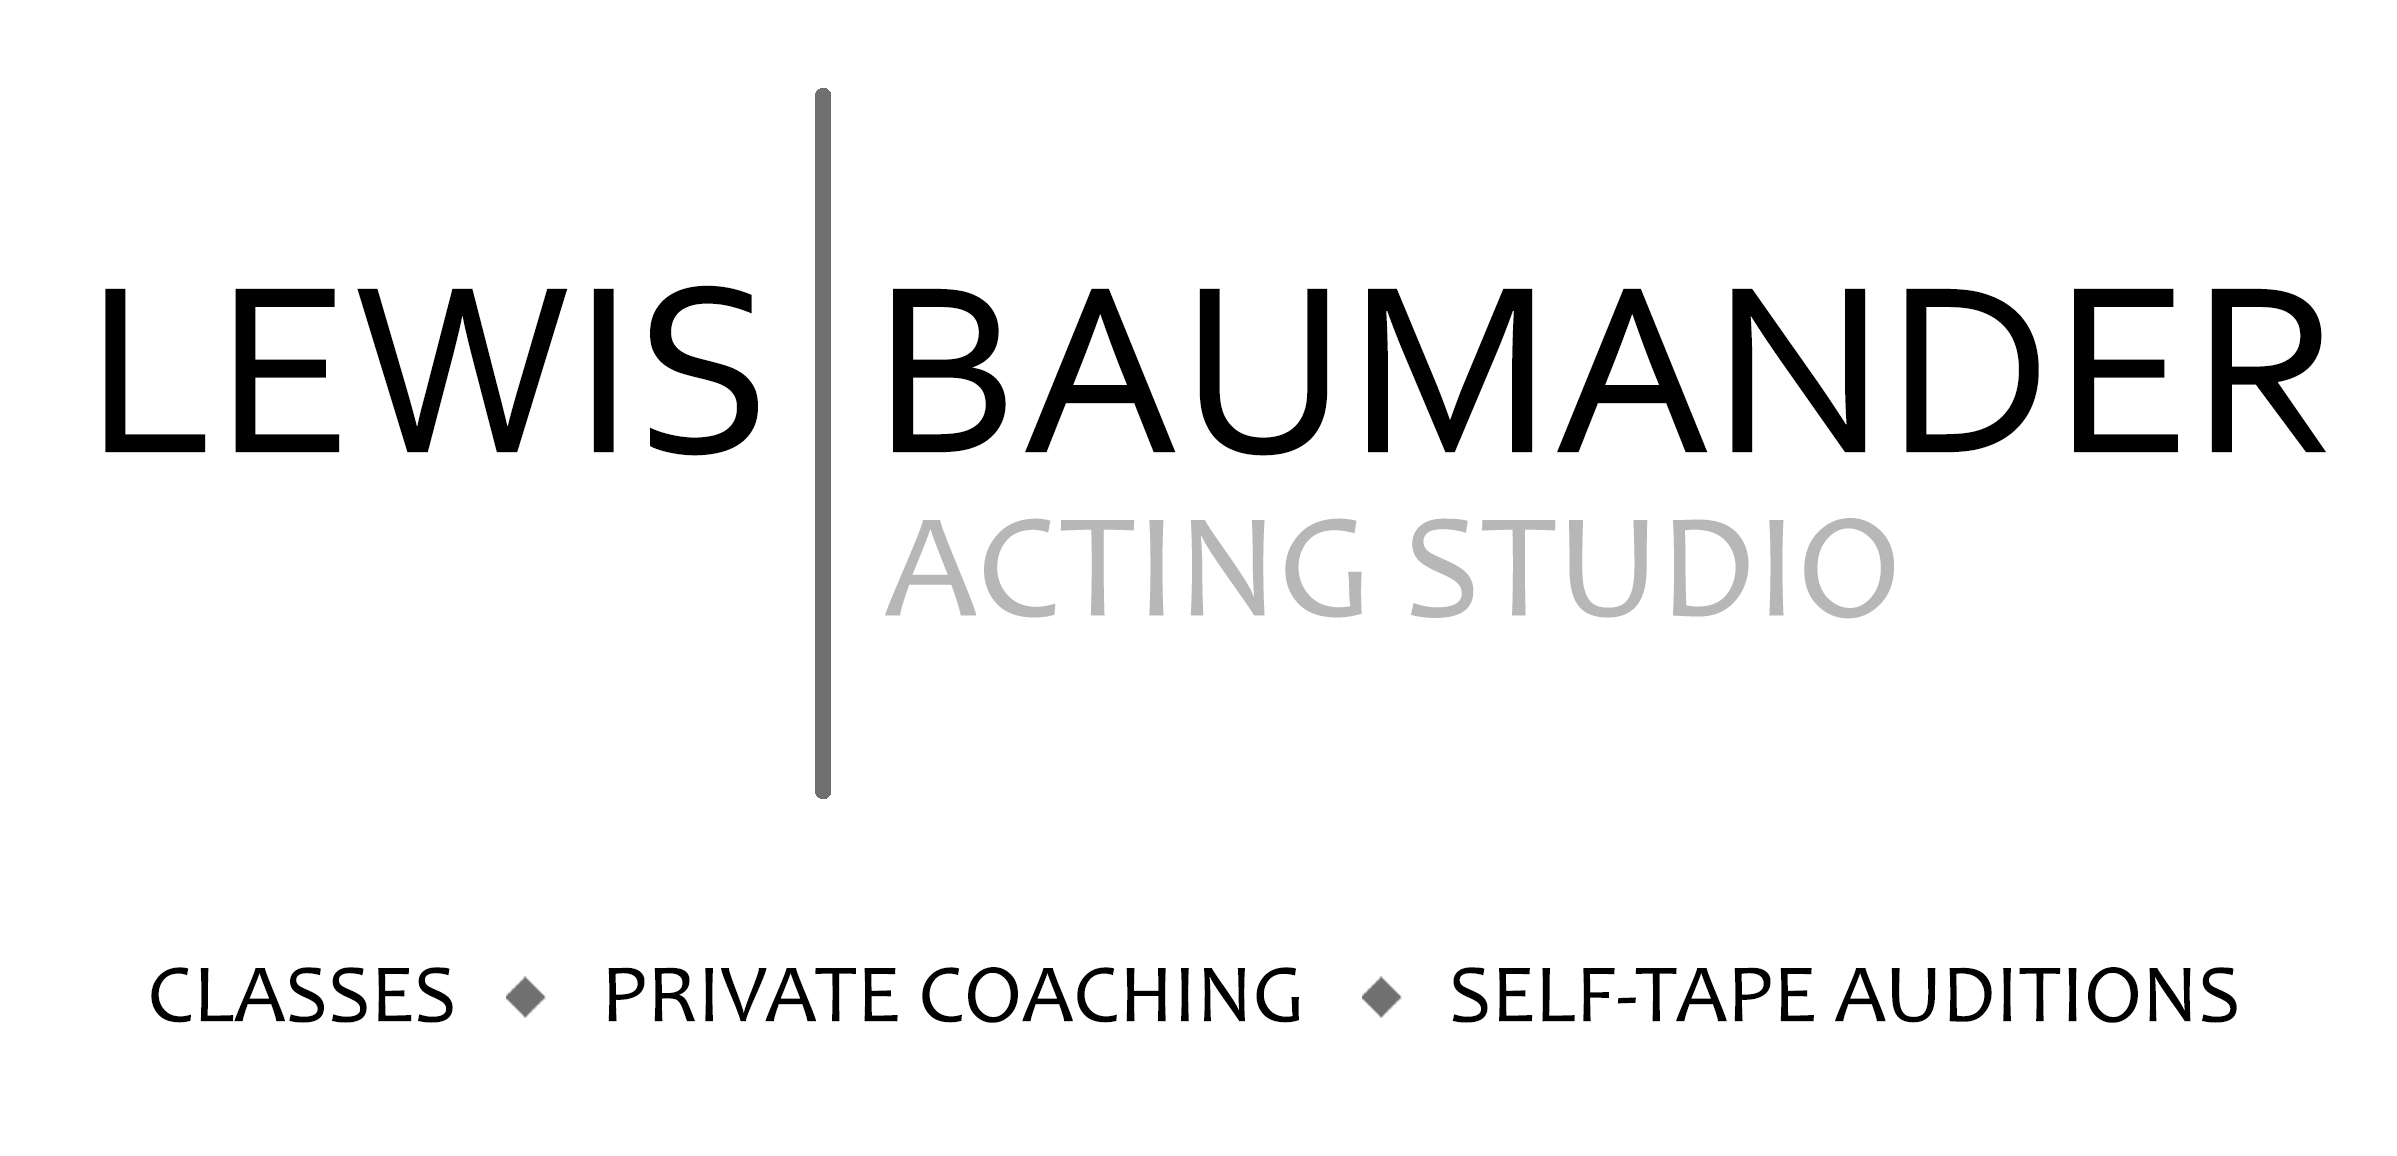 Lewis Baumander Acting Studio is a proud sponsor of The Actor Symposium Series: Toronto